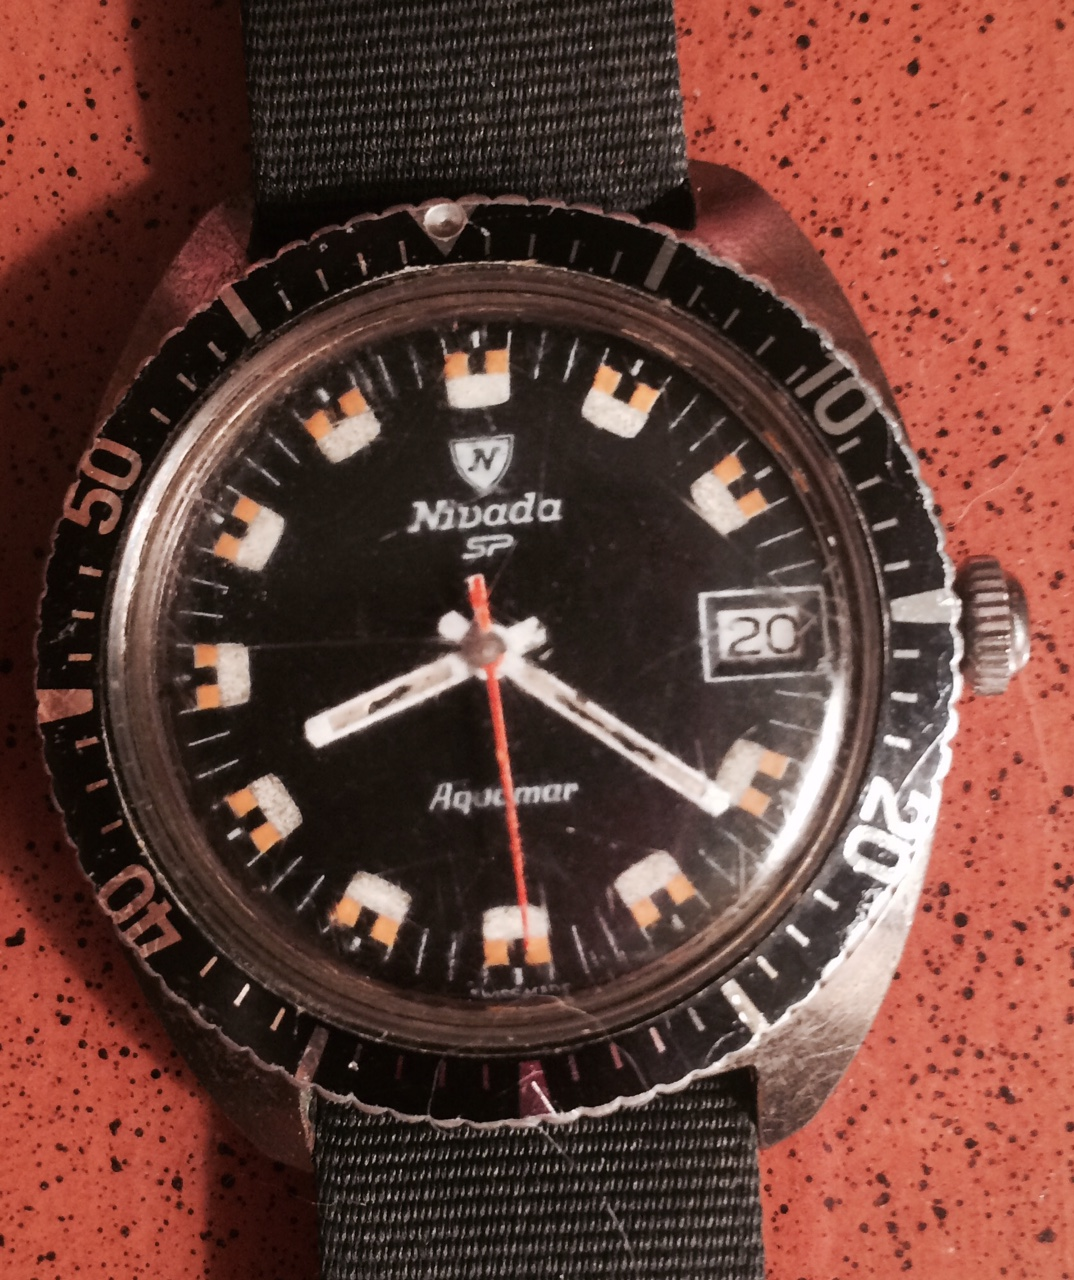 Name:  Nivada Aquamar Watch Front.jpg Views: 316 Size:  487.2 KB